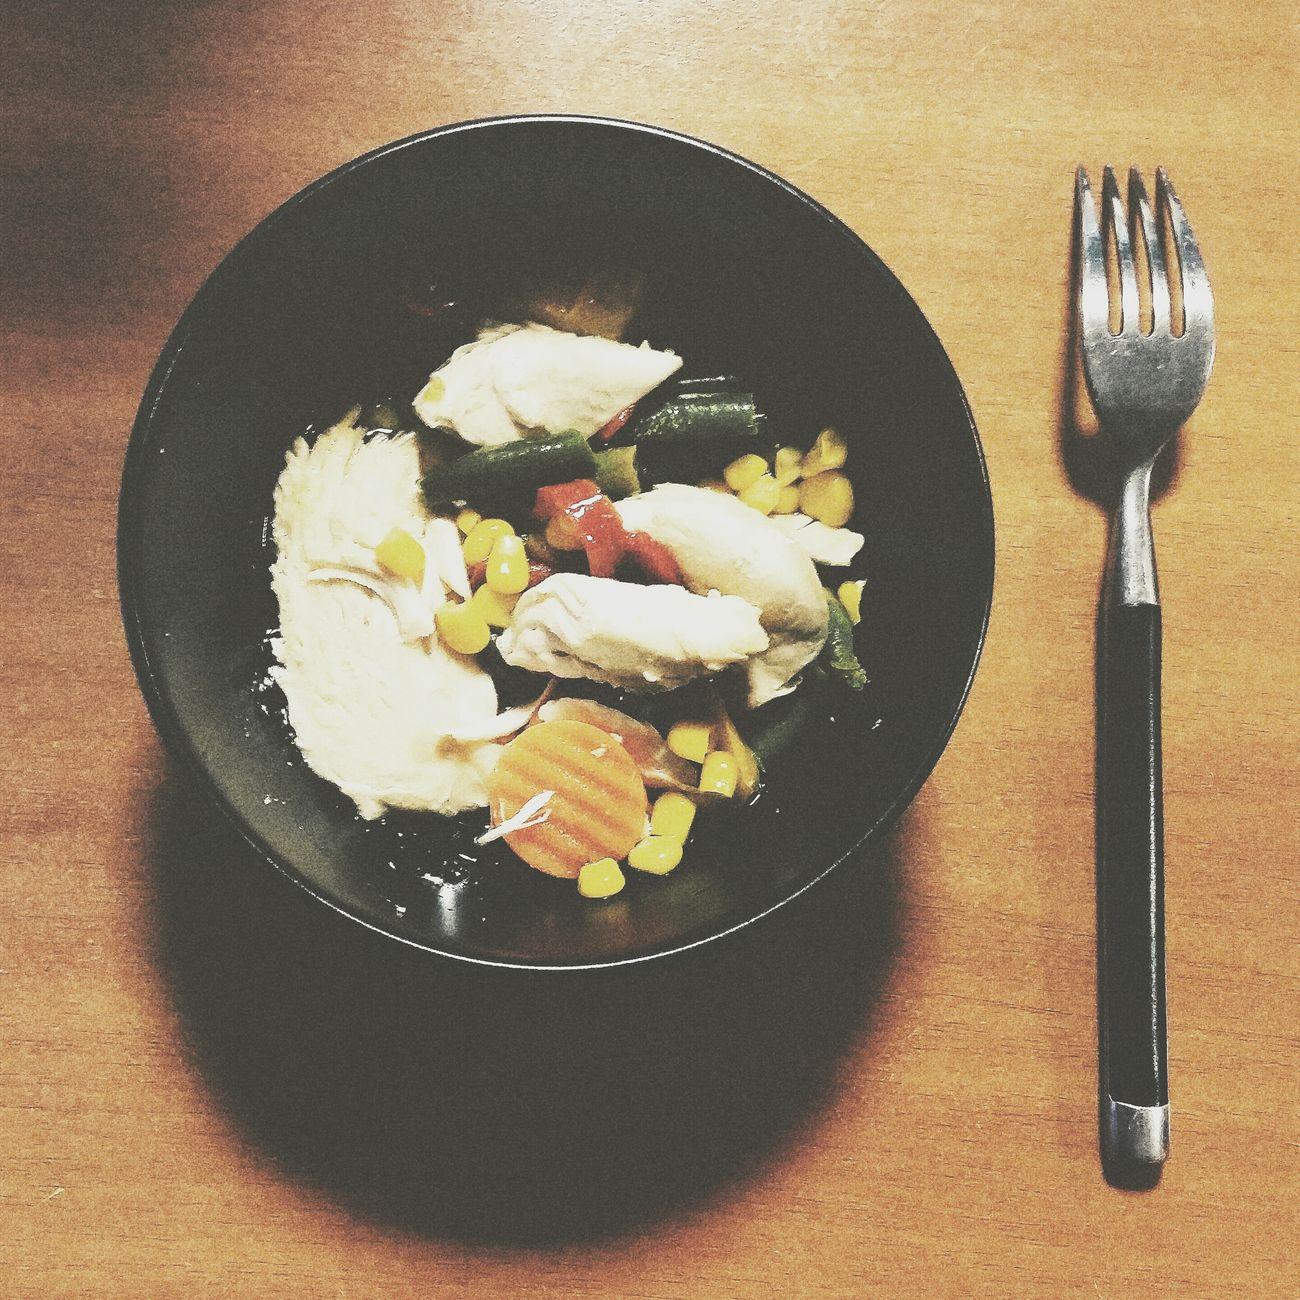 Fitness Novokosino Diet